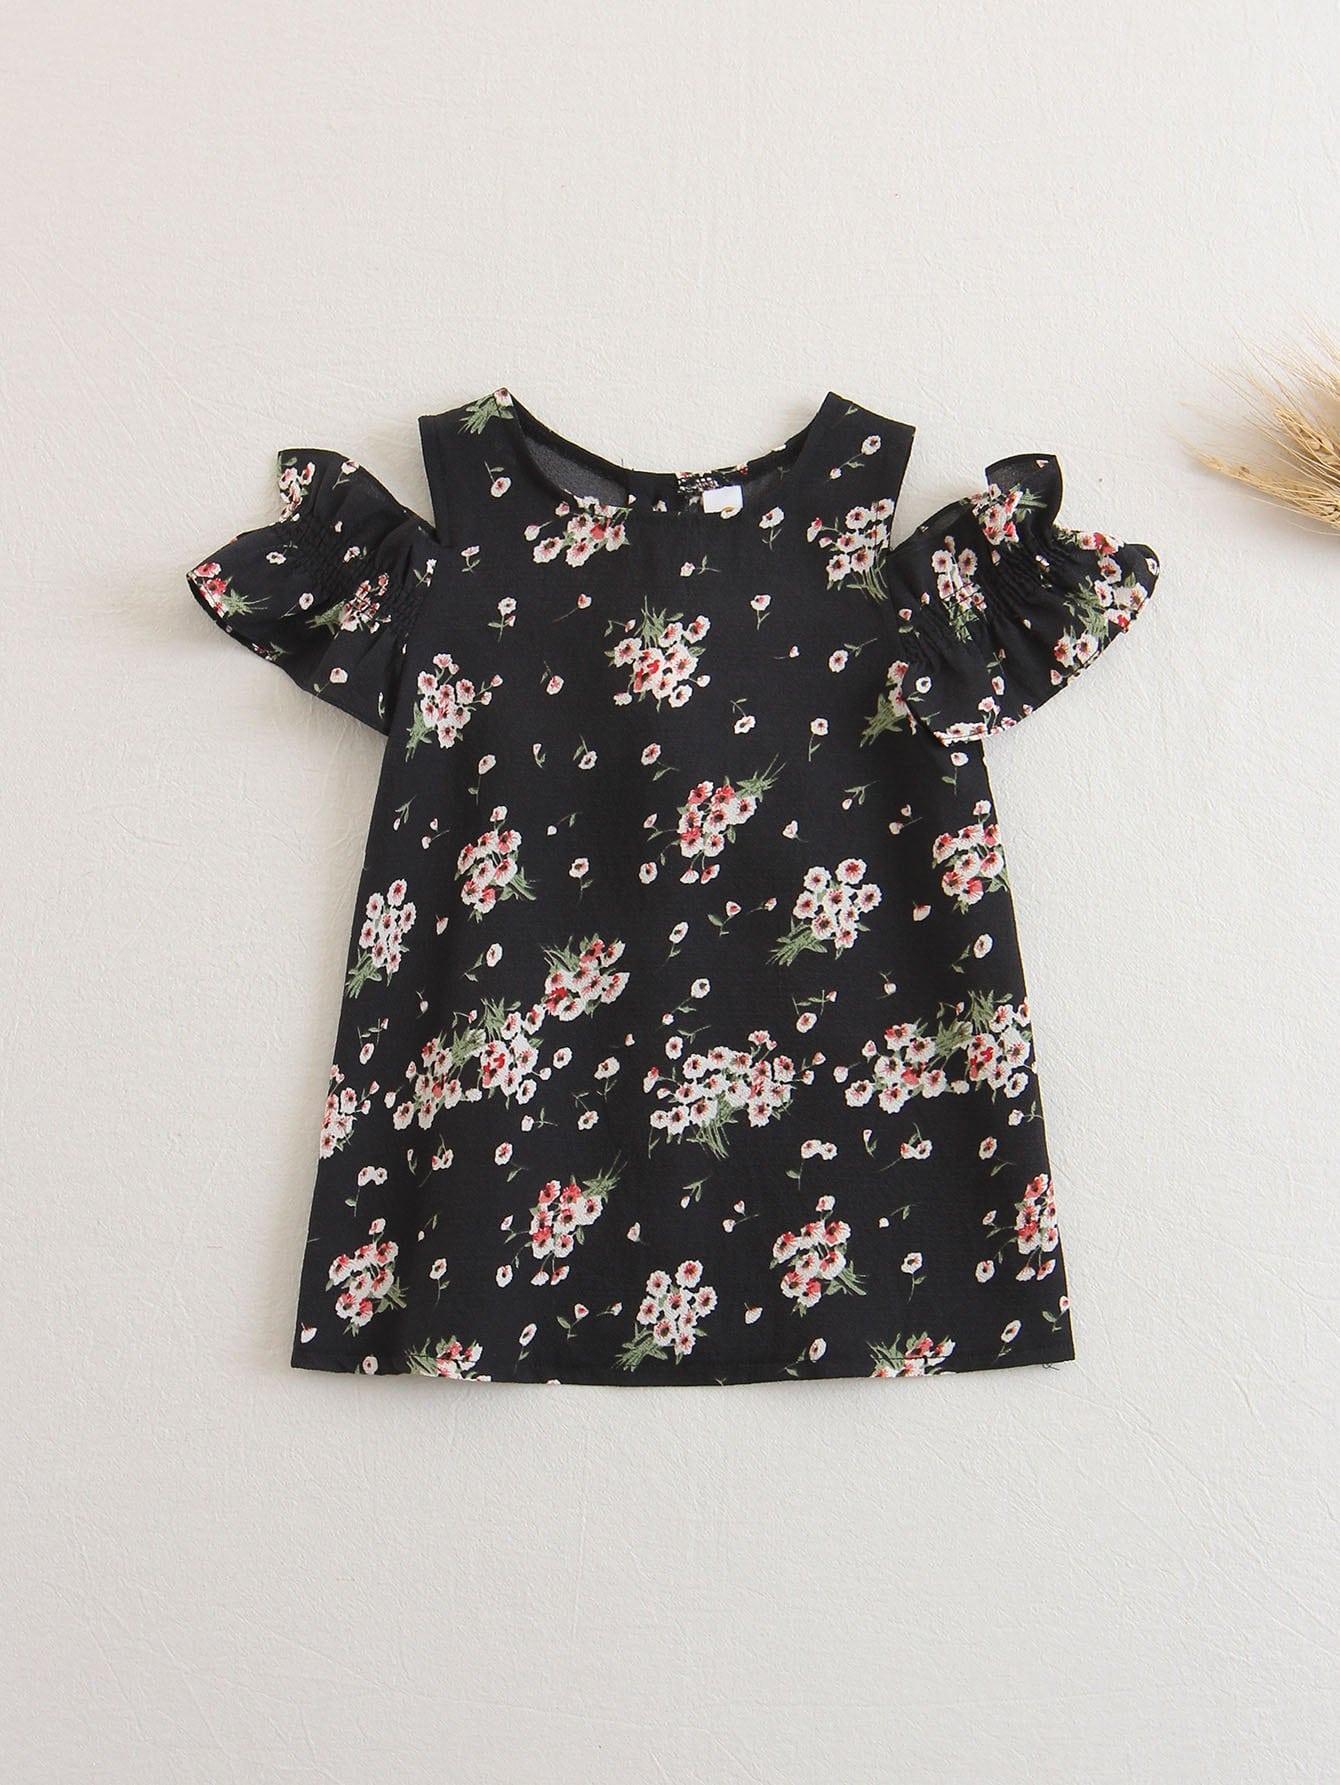 Kids Floral Cold Shoulder Dress степлер matrix 40901